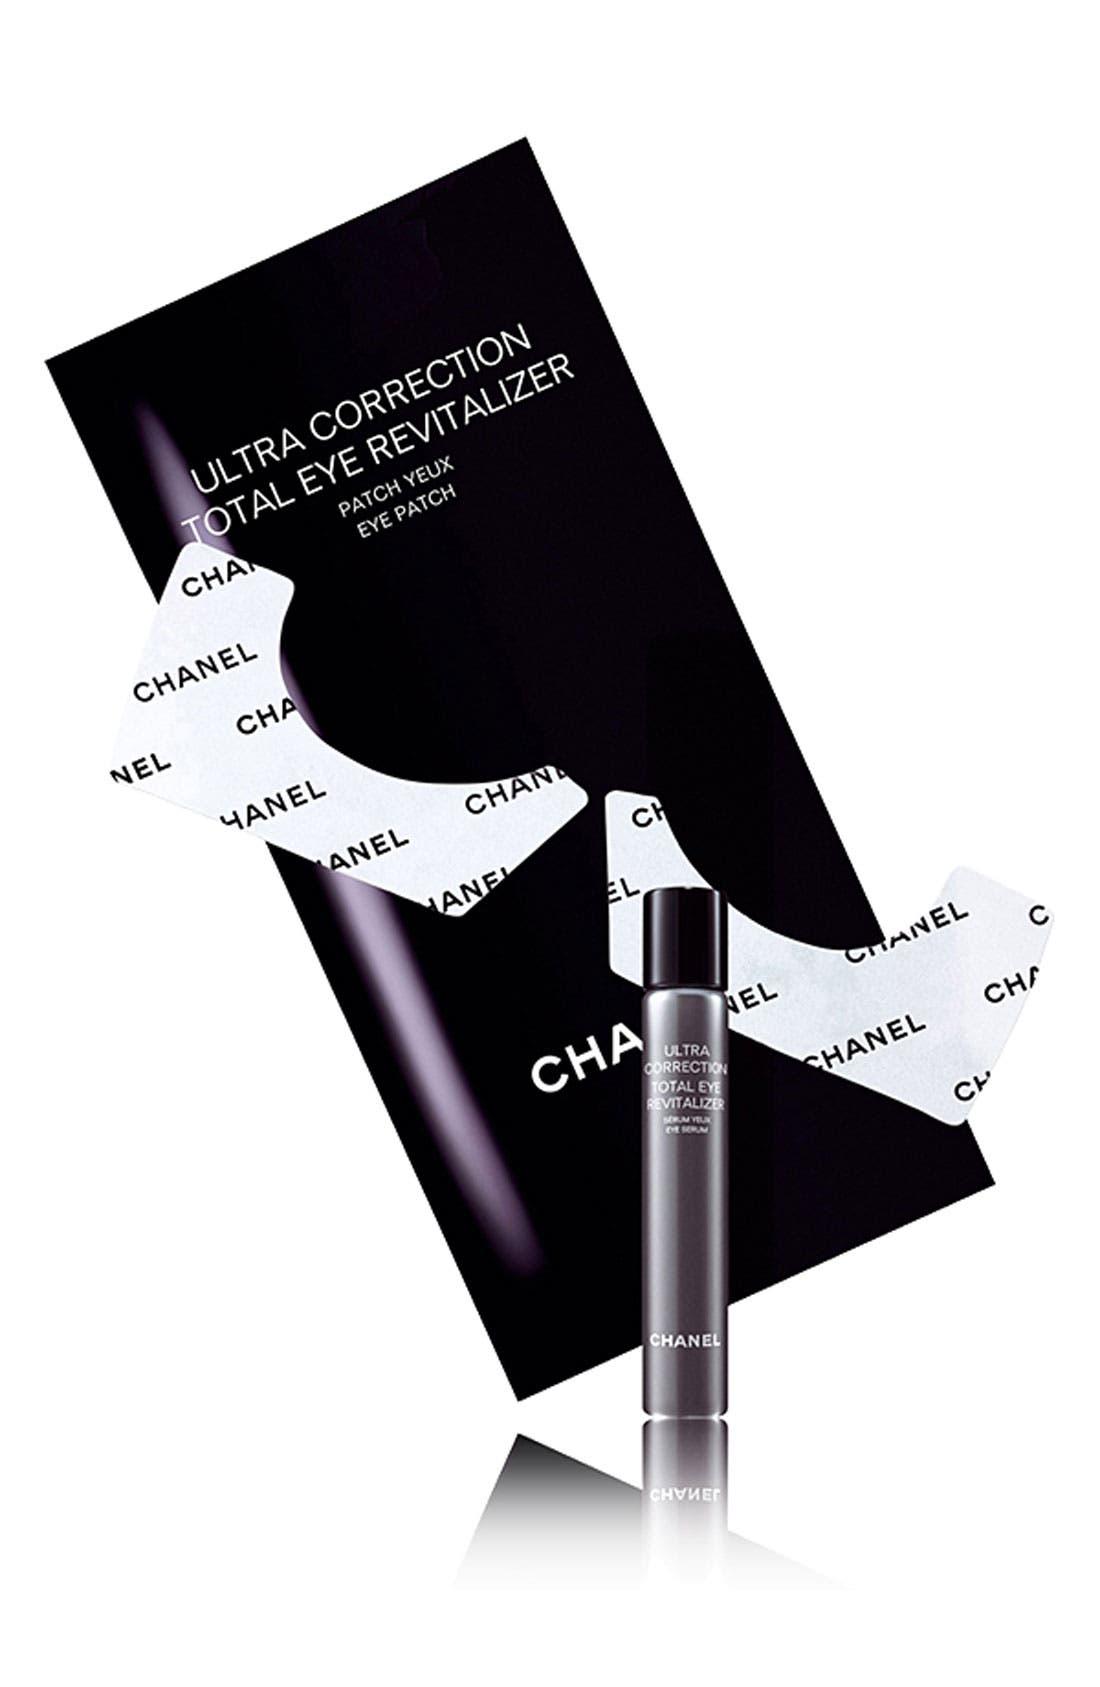 CHANEL ULTRA CORRECTION  Total Eye Revitalizer